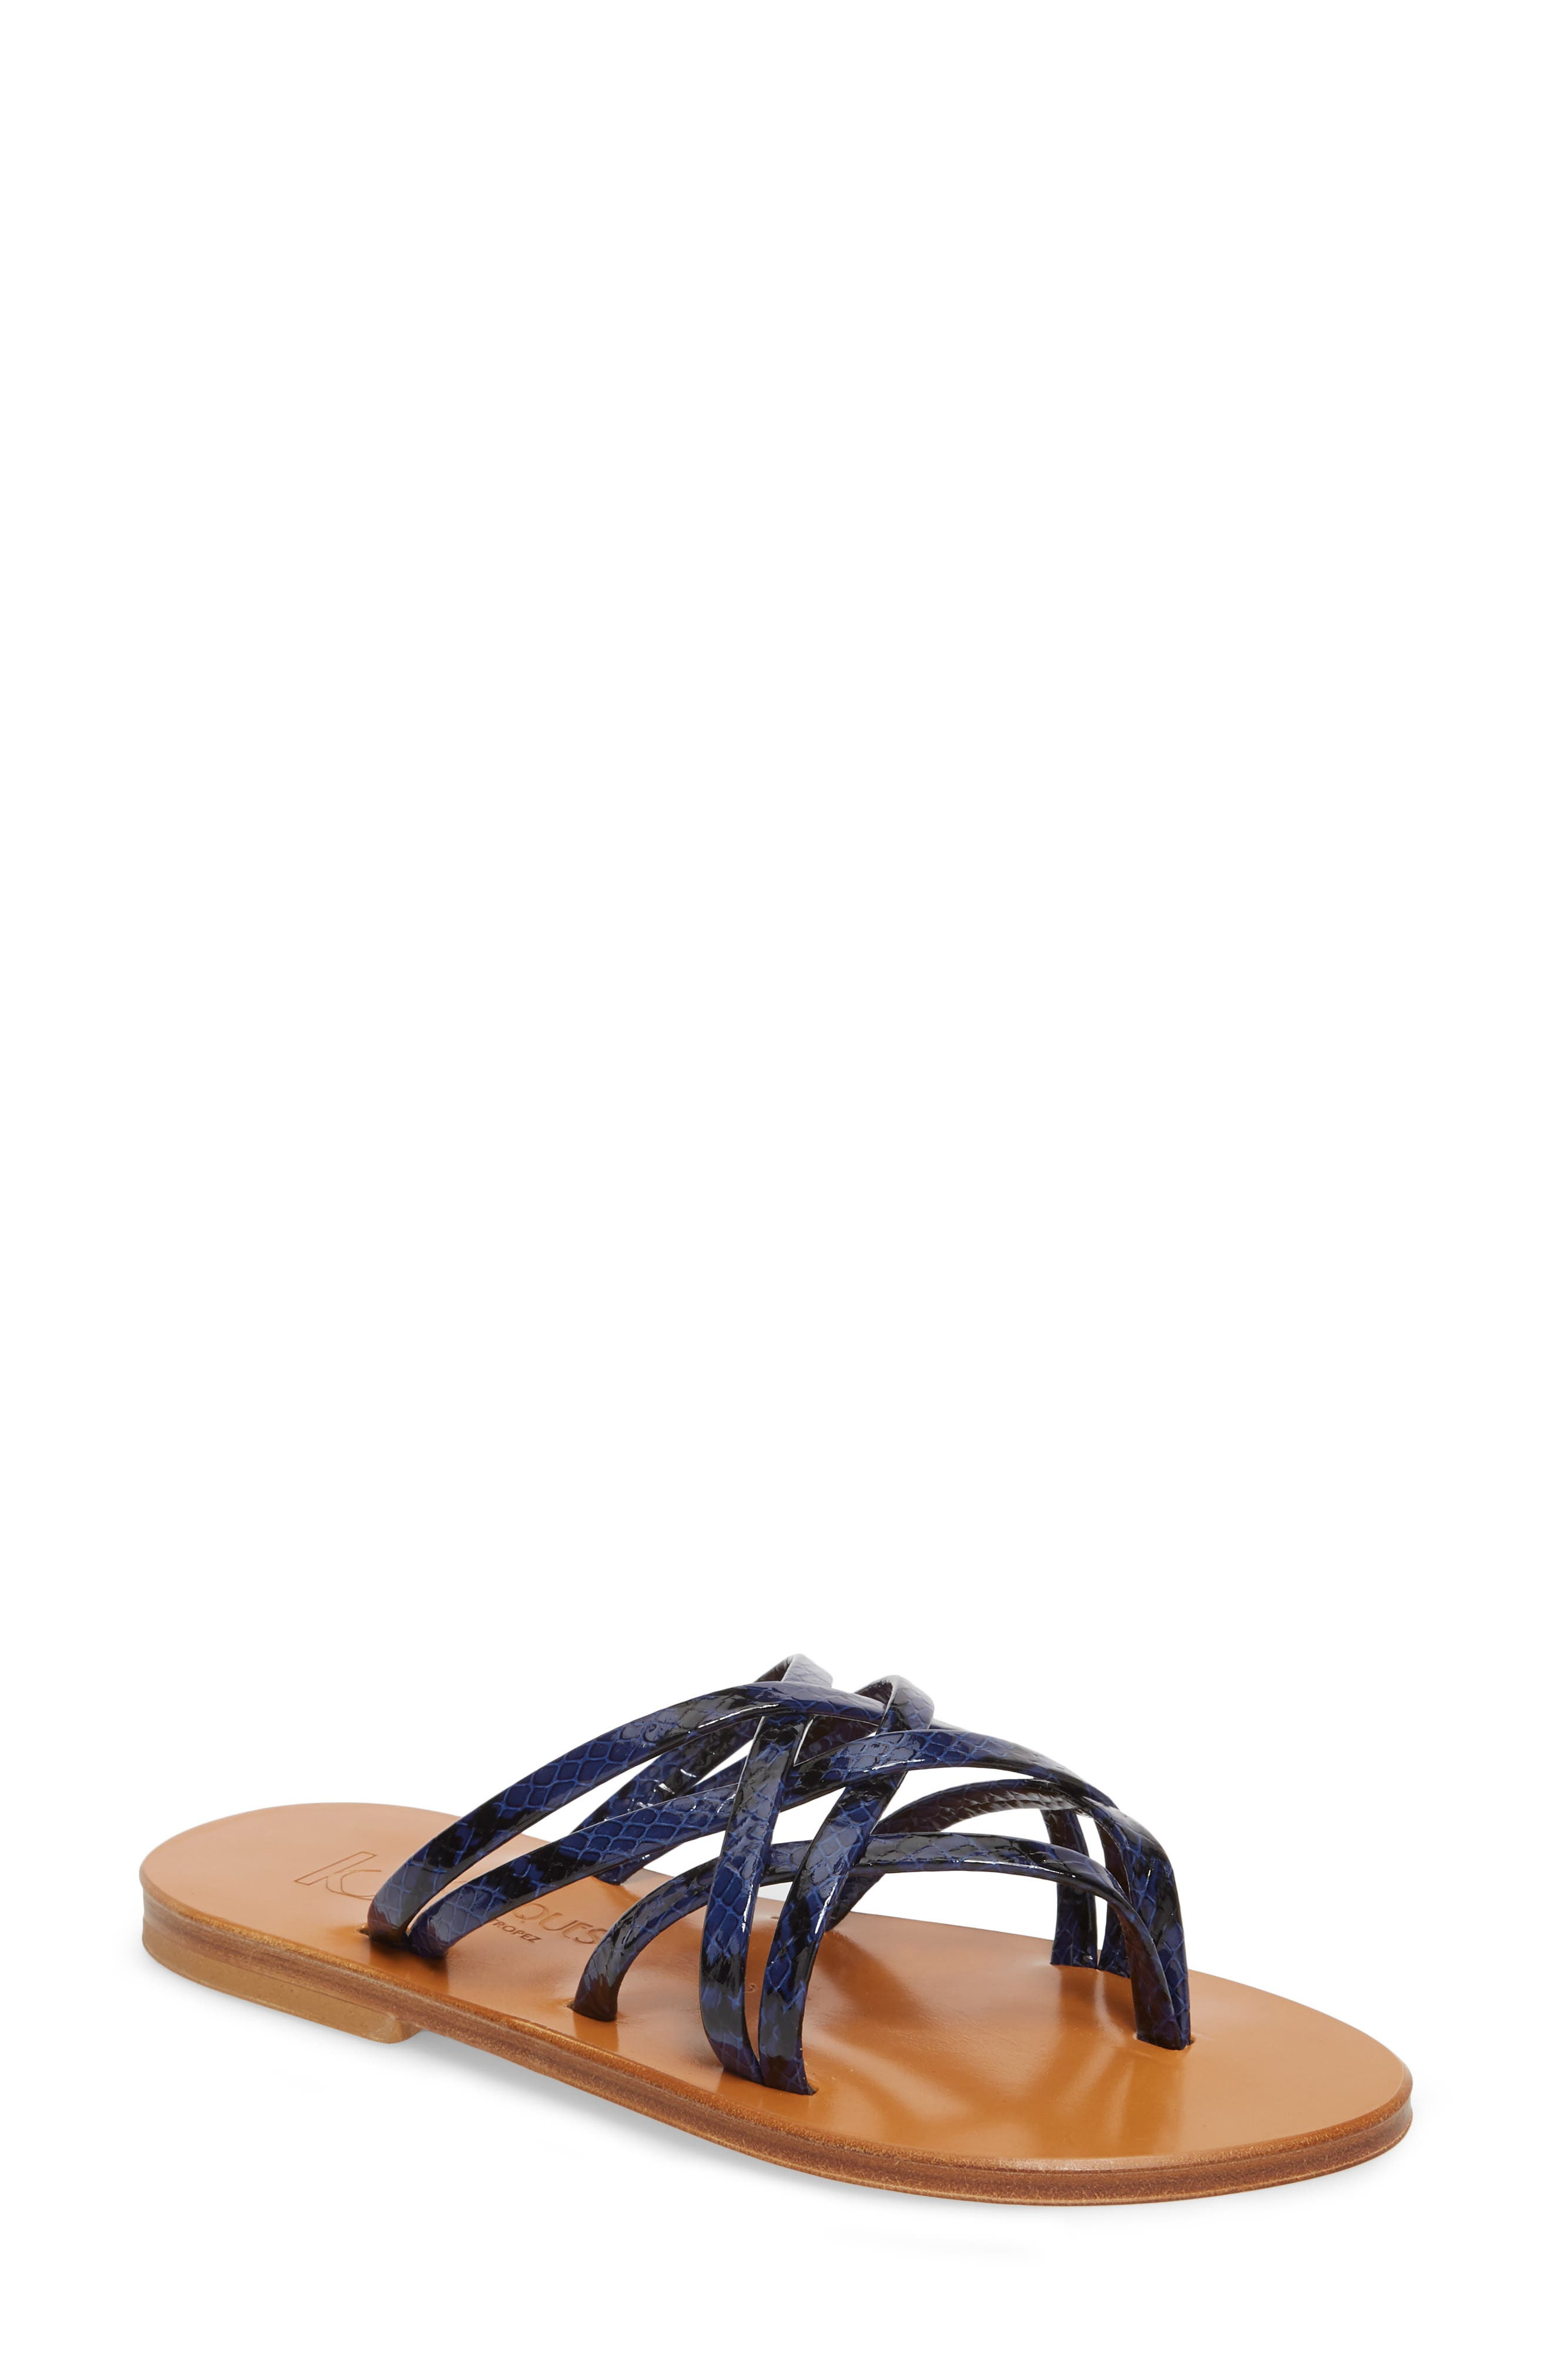 K. Jacques St. Tropez Strappy Thong Sandal,                             Main thumbnail 2, color,